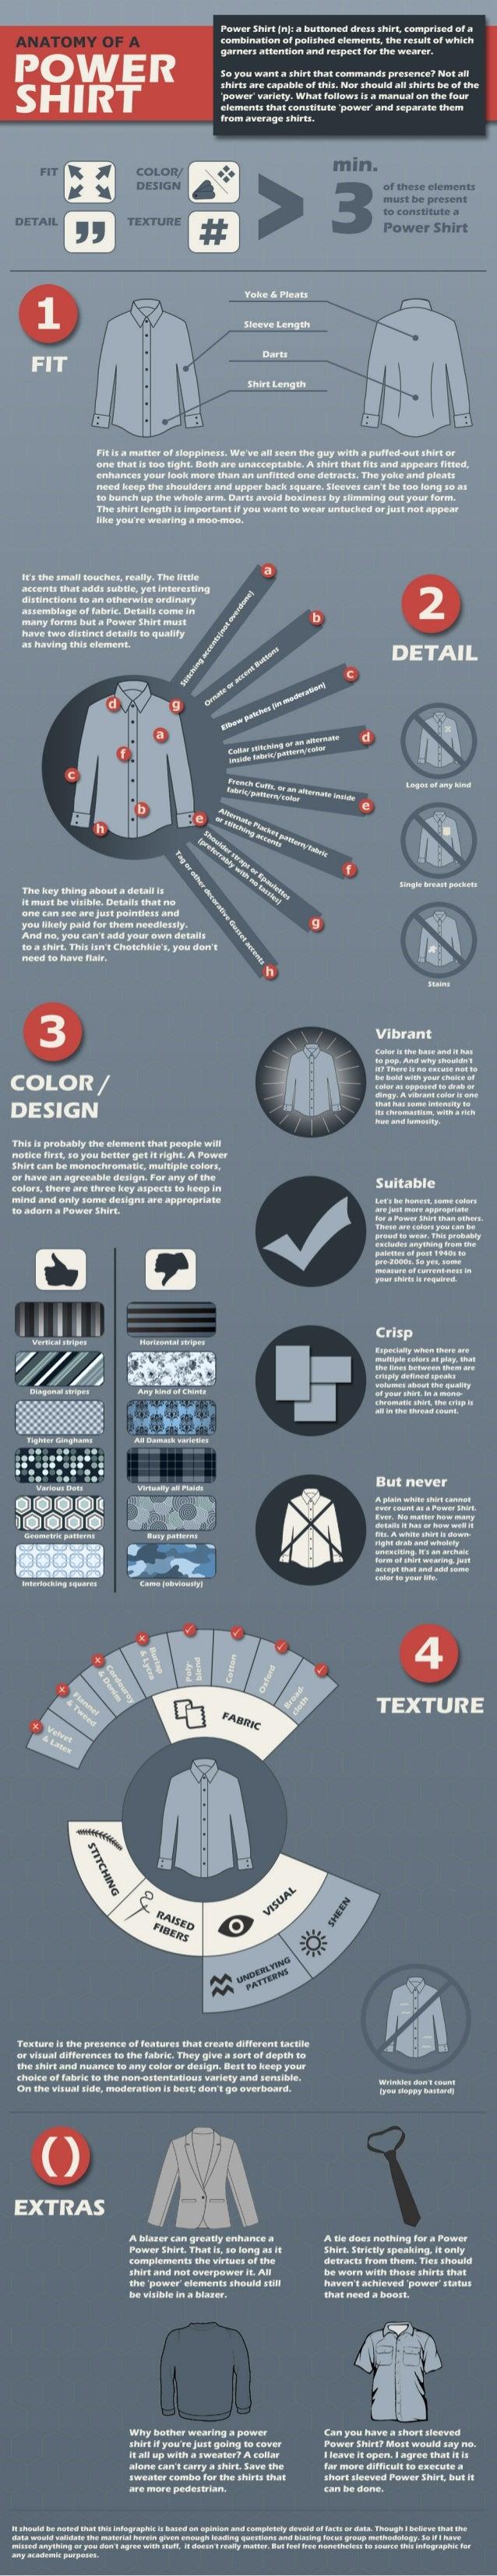 Power Shirts Infographic